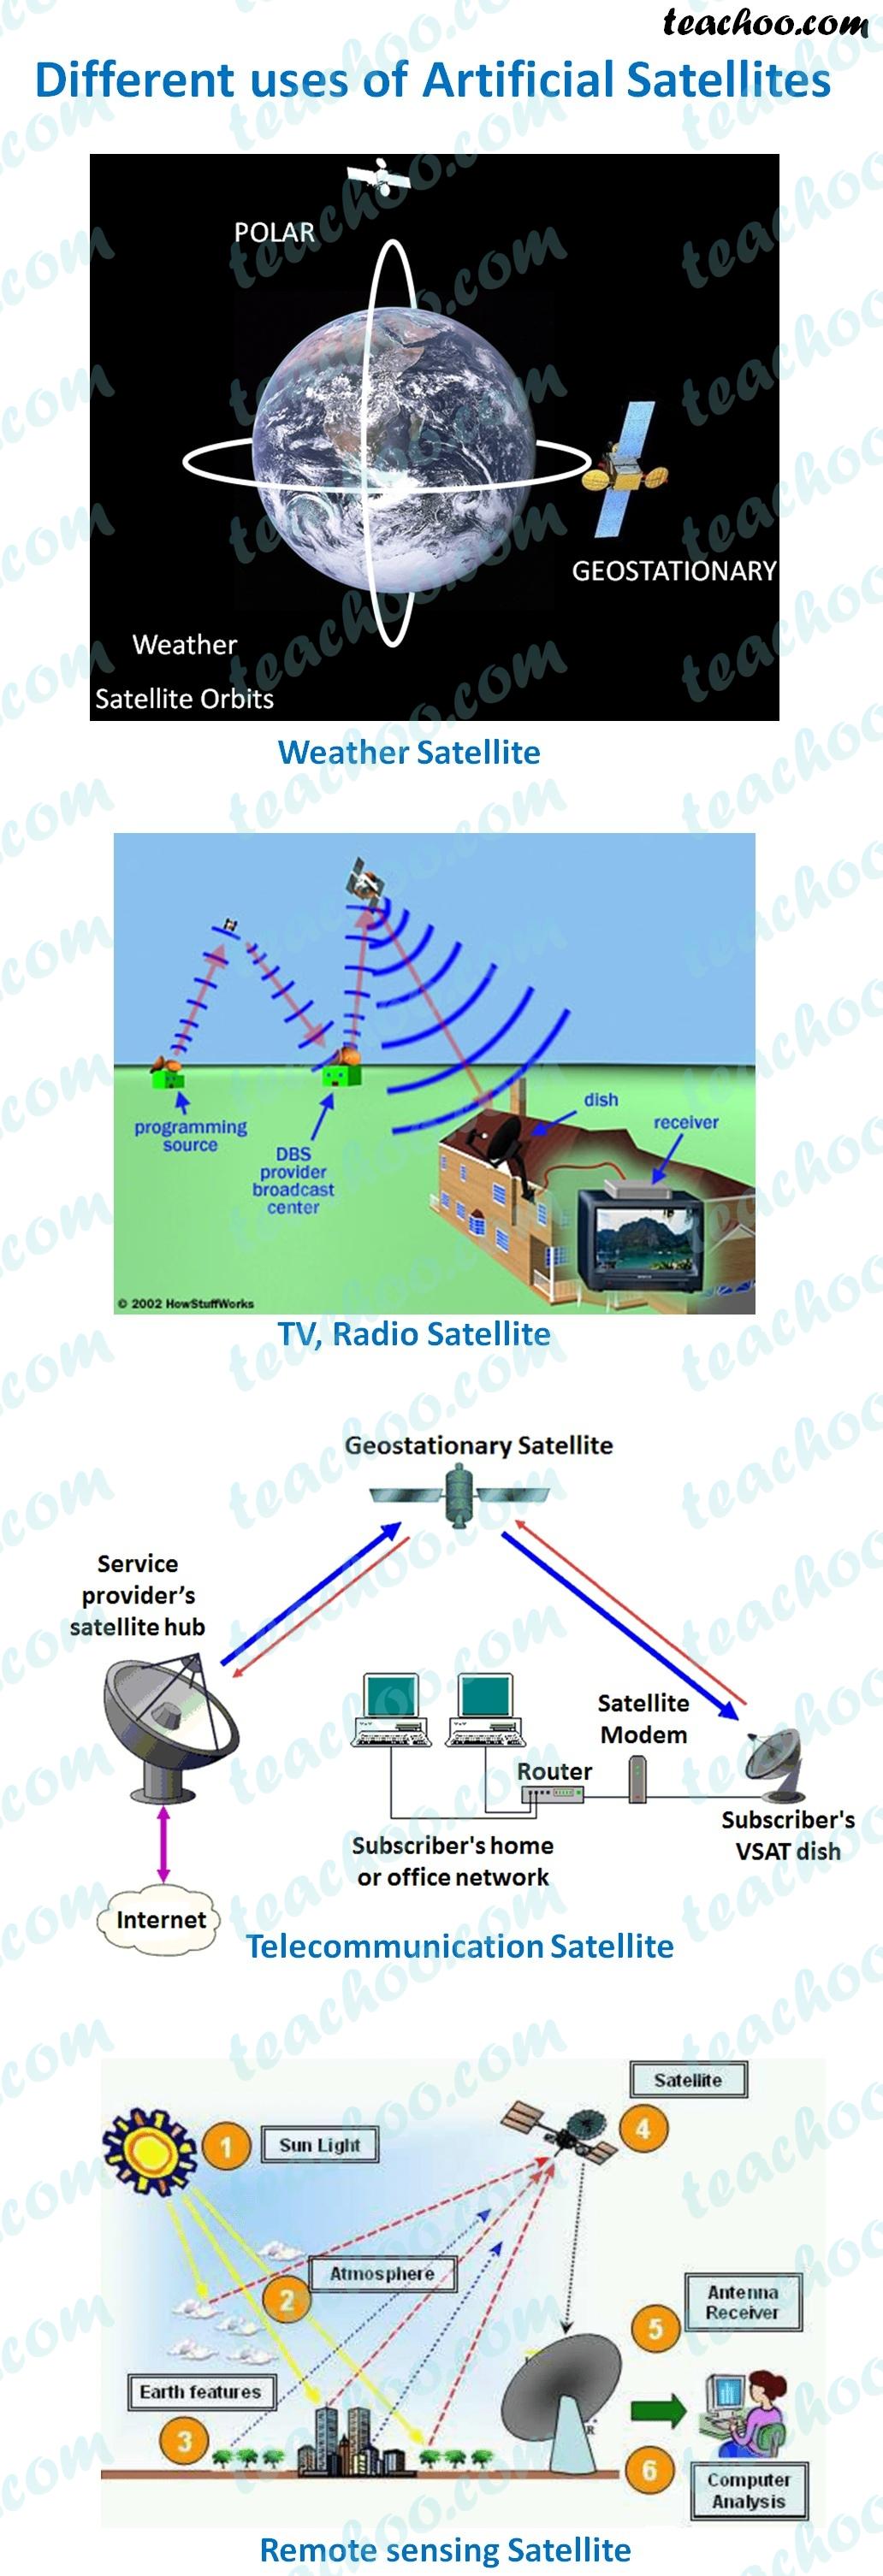 different-uses-of-artificial-satellites---teachoo.jpg